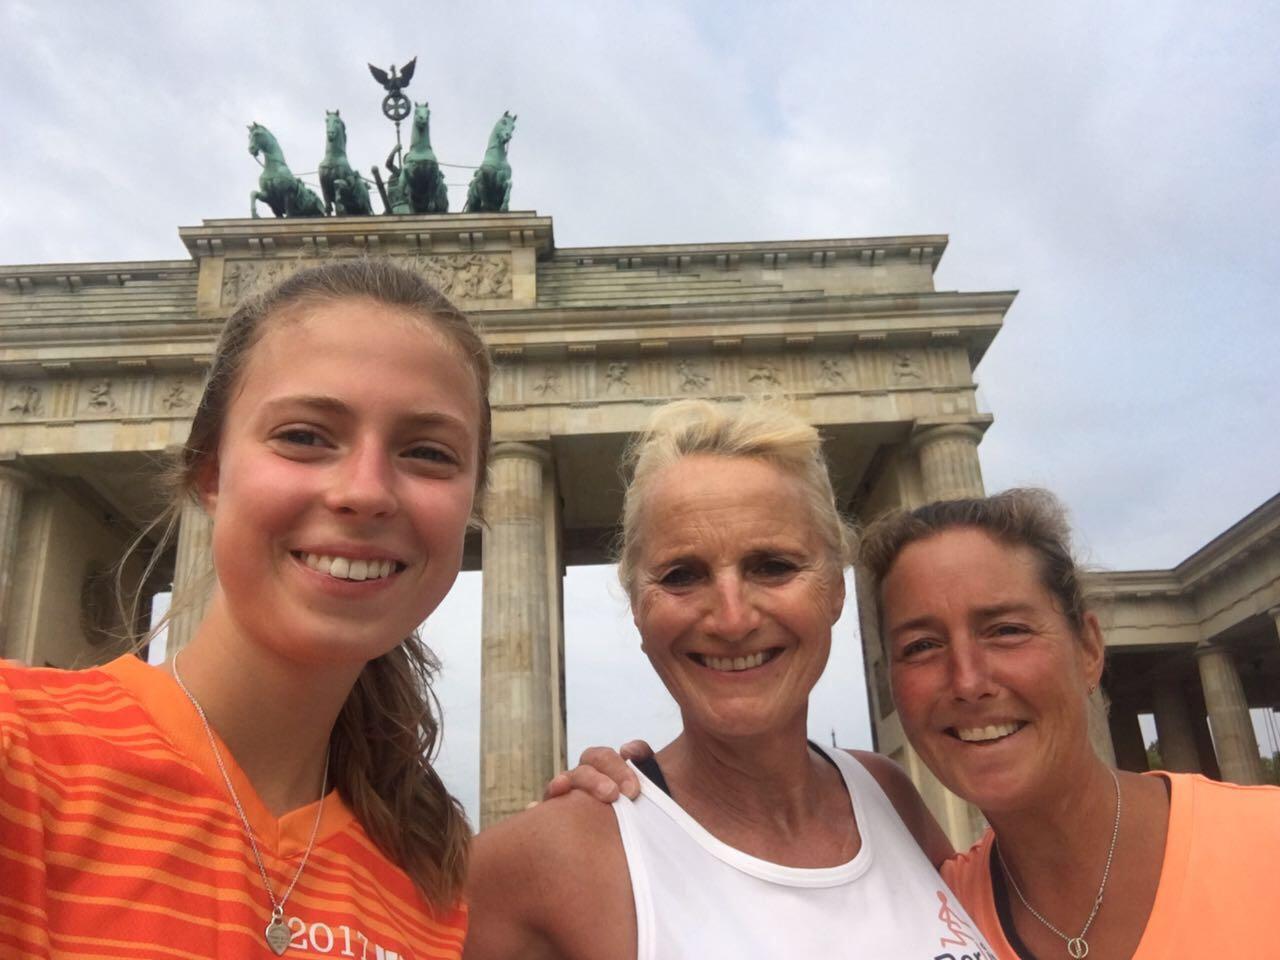 Mit Berlin Sightrunning am Brandenburger Tor